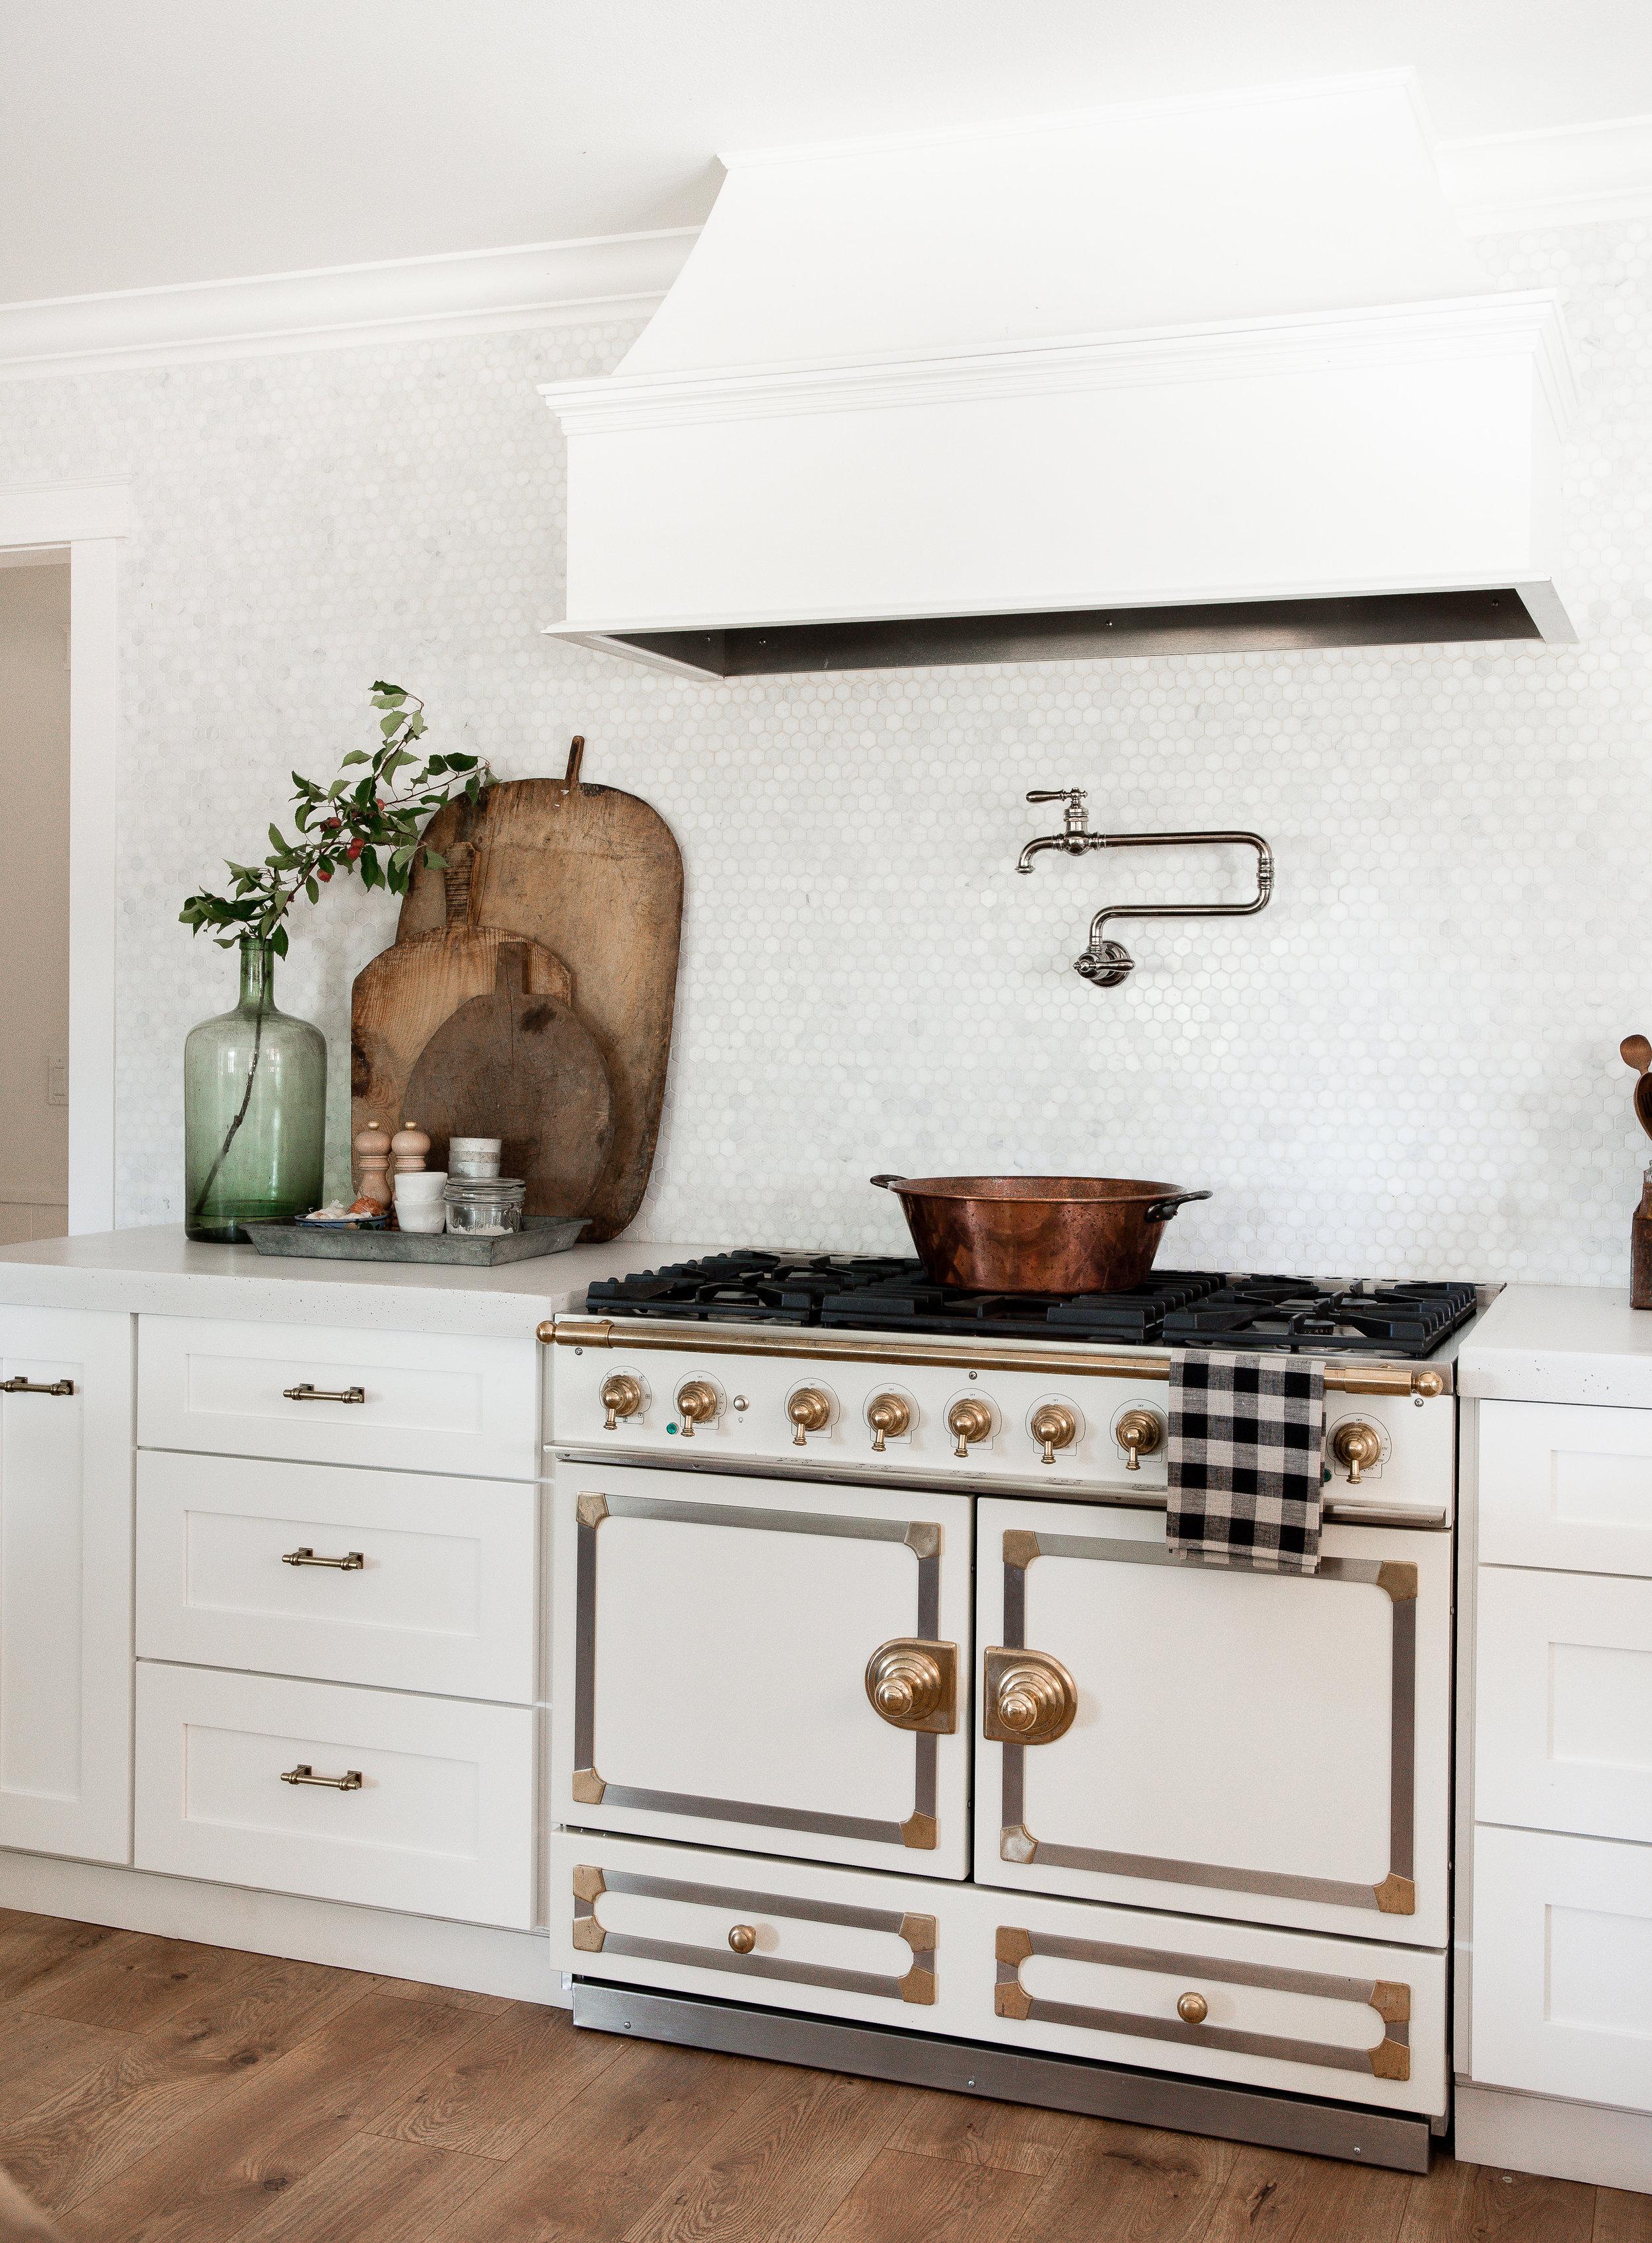 Beautiful white modern farmhouse kitchen with brass hardware and LaCornue stove #farmhousekitchen #modernfarmhouse #whitekitchen